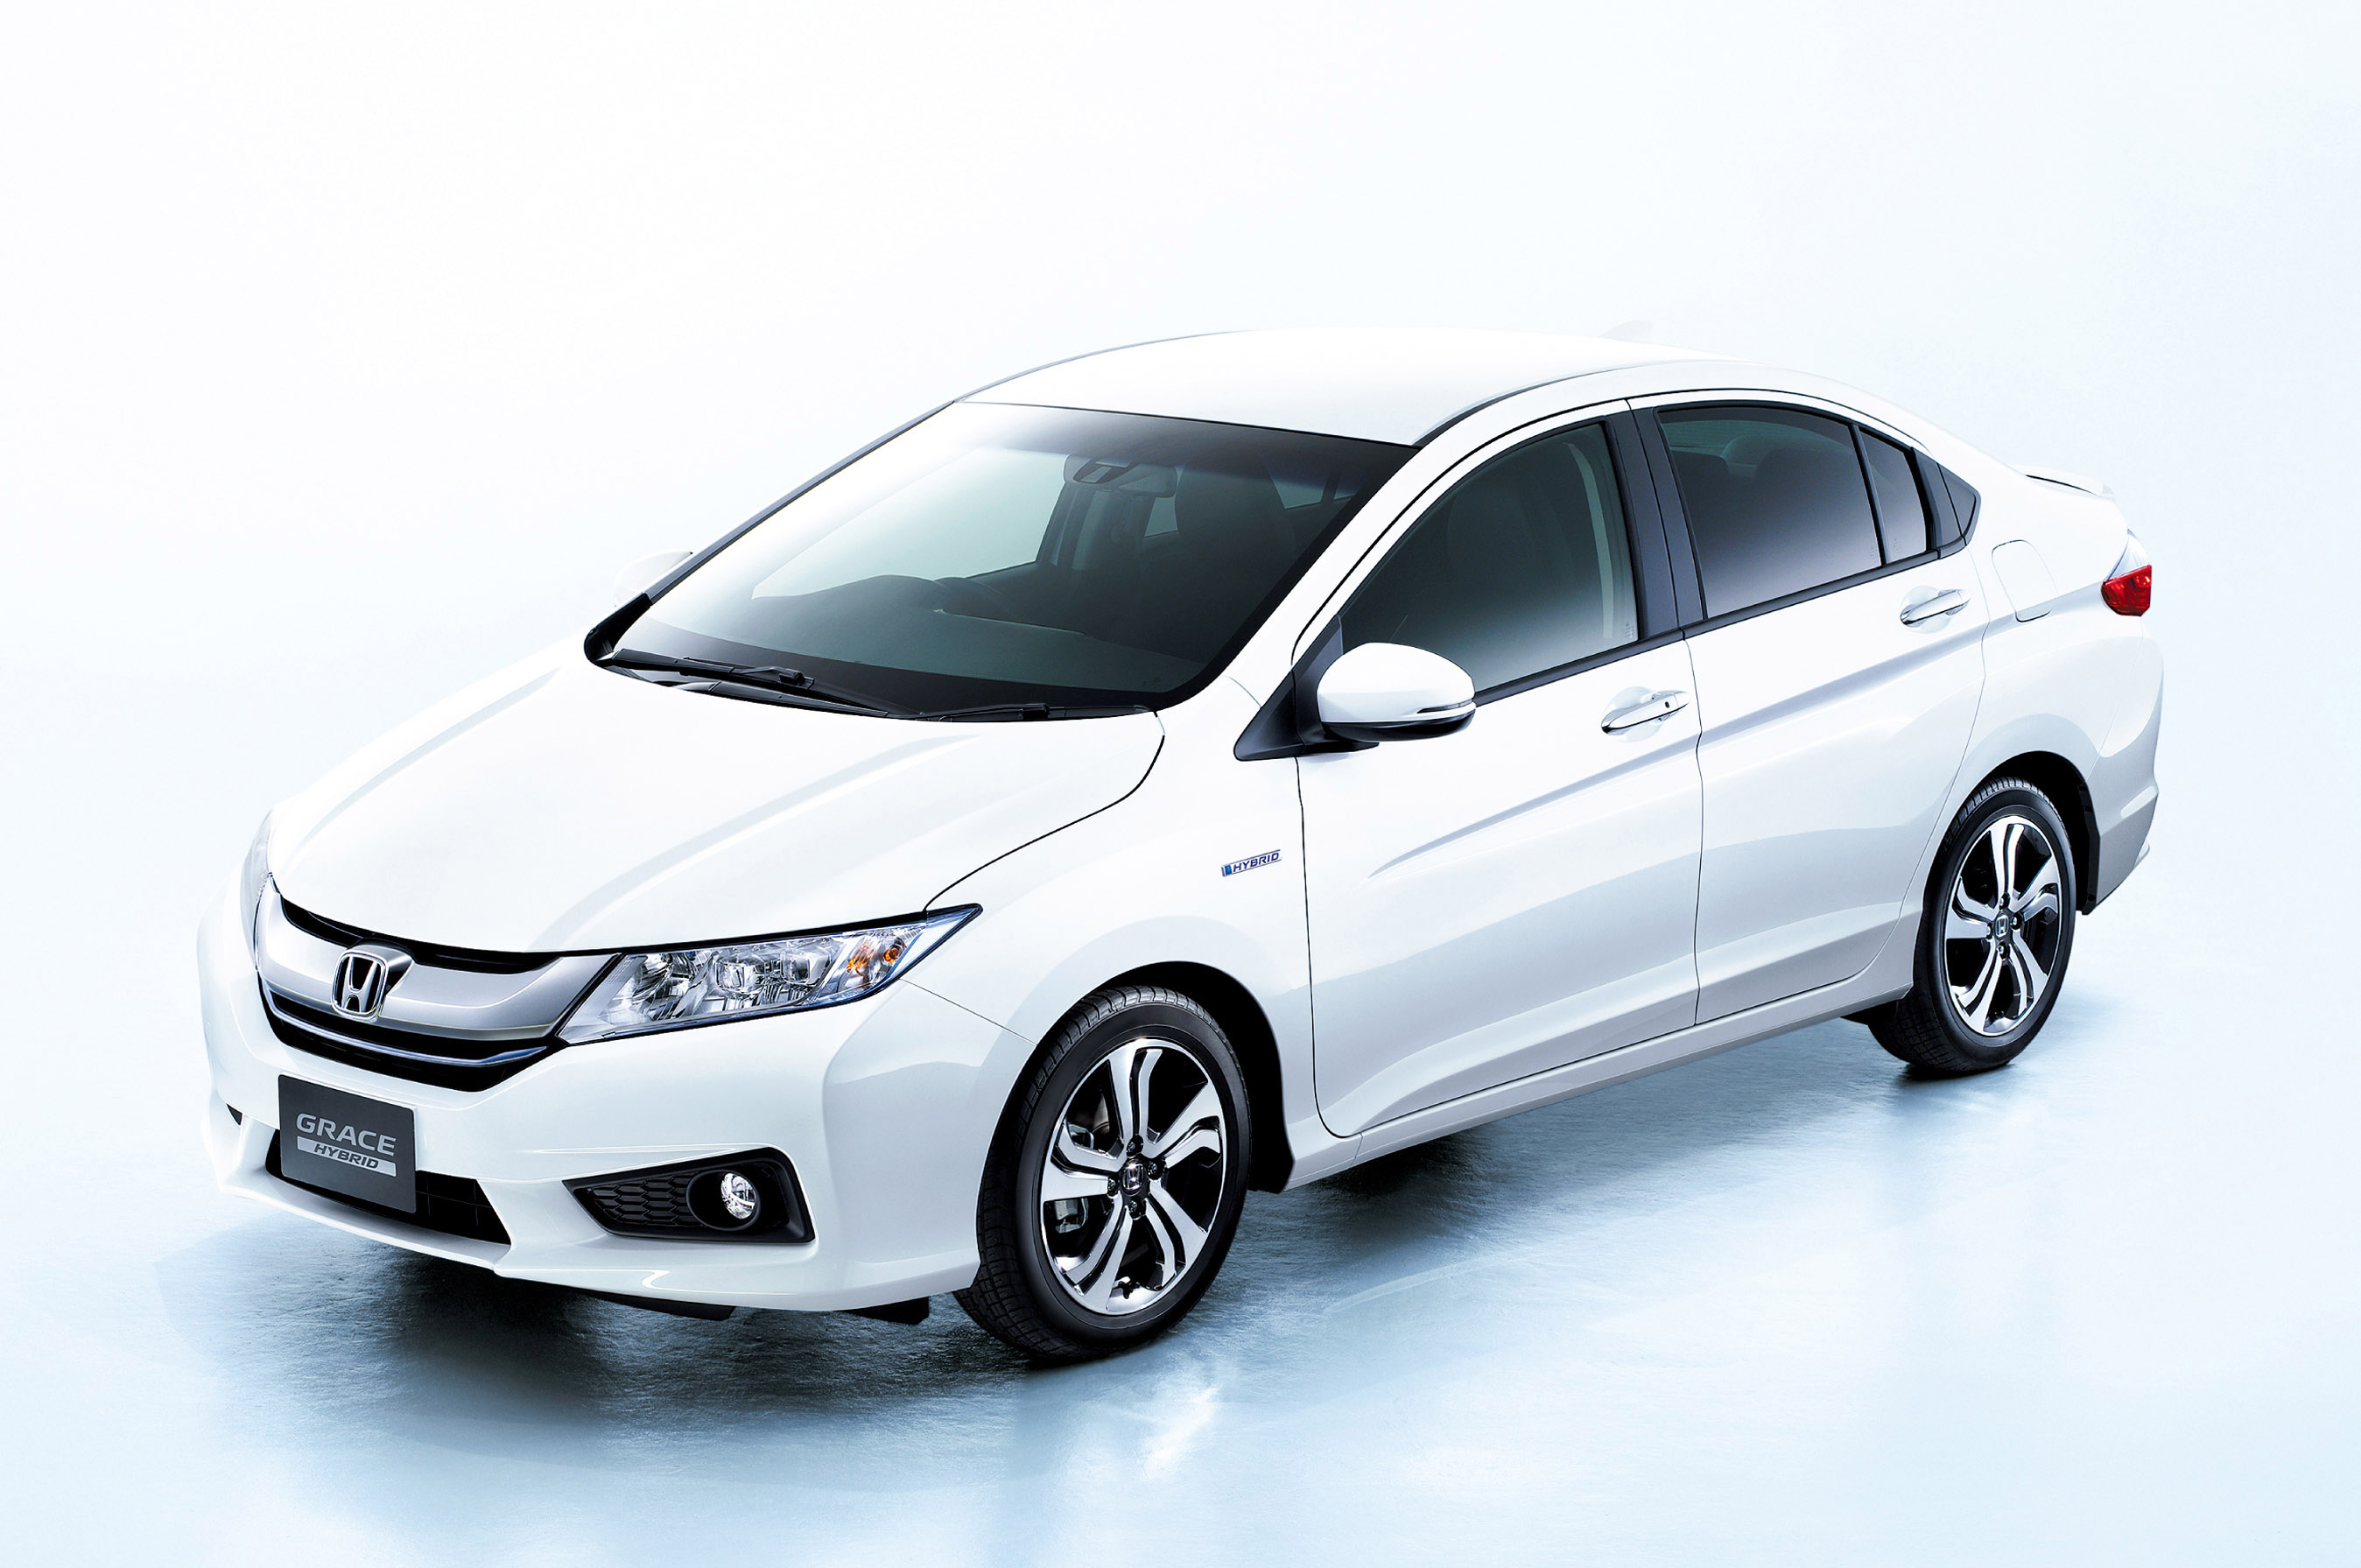 2015 Honda Grace Hybrid Picture 113965